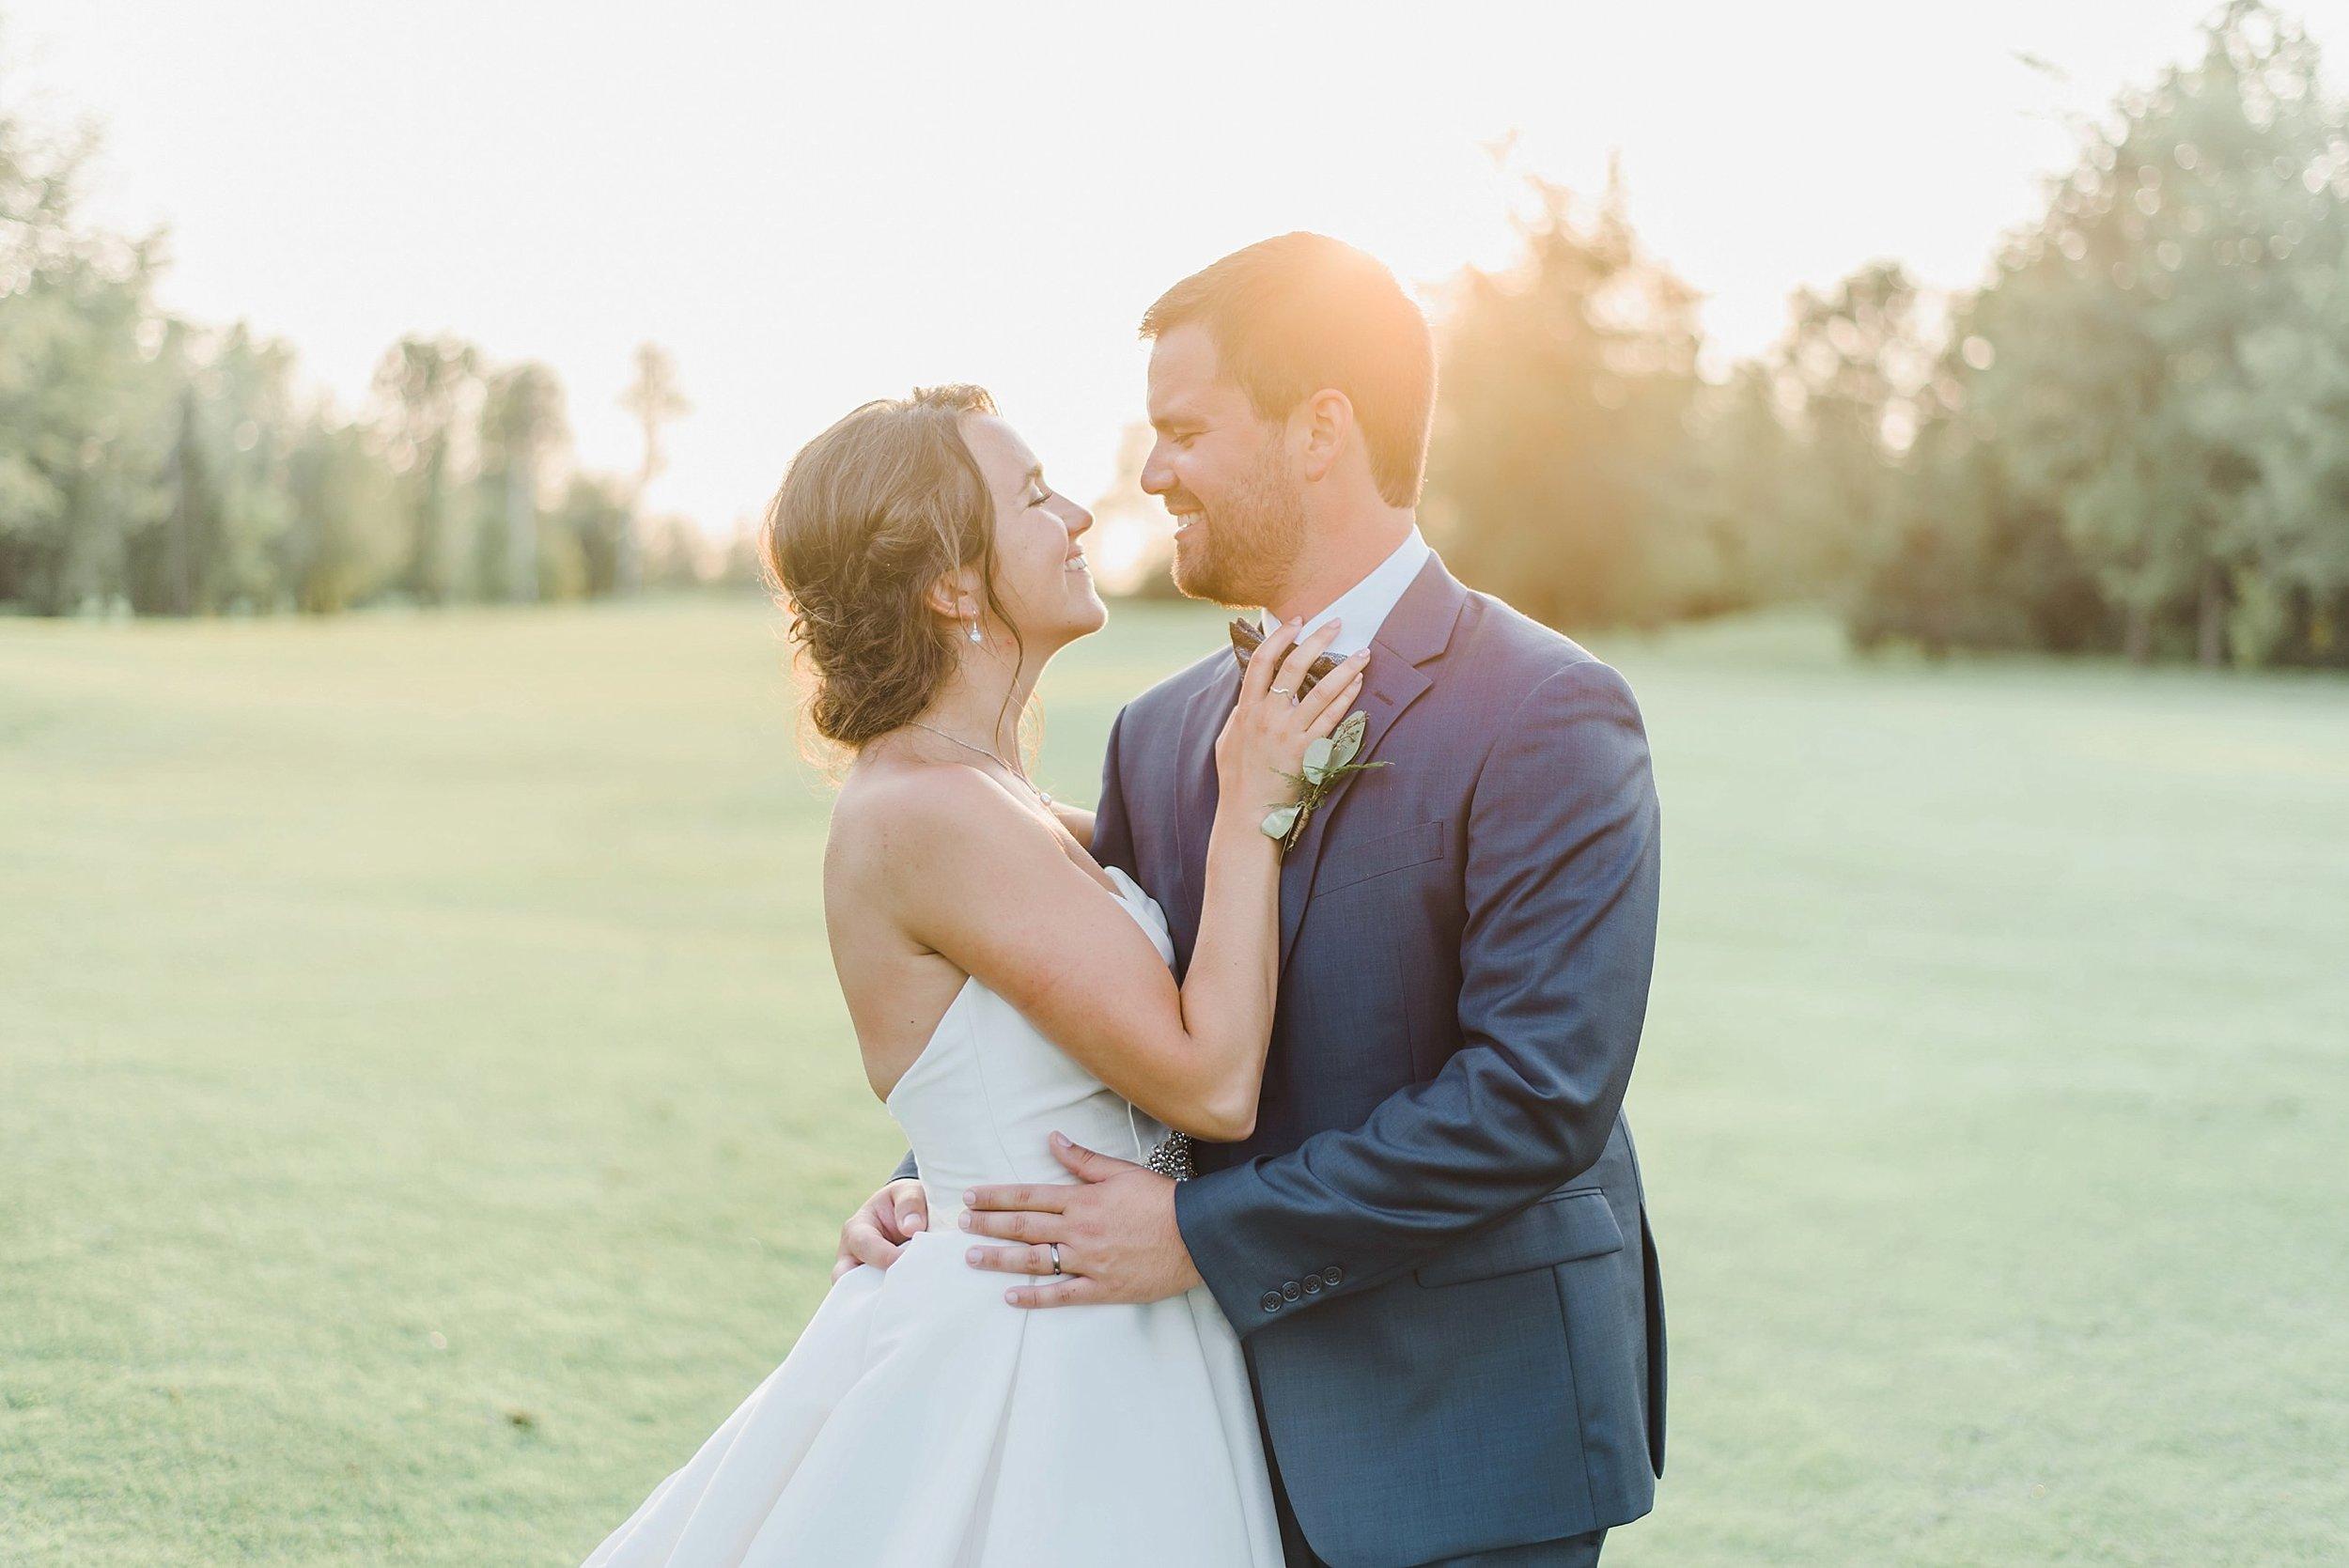 light airy indie fine art ottawa wedding photographer | Ali and Batoul Photography_0576.jpg